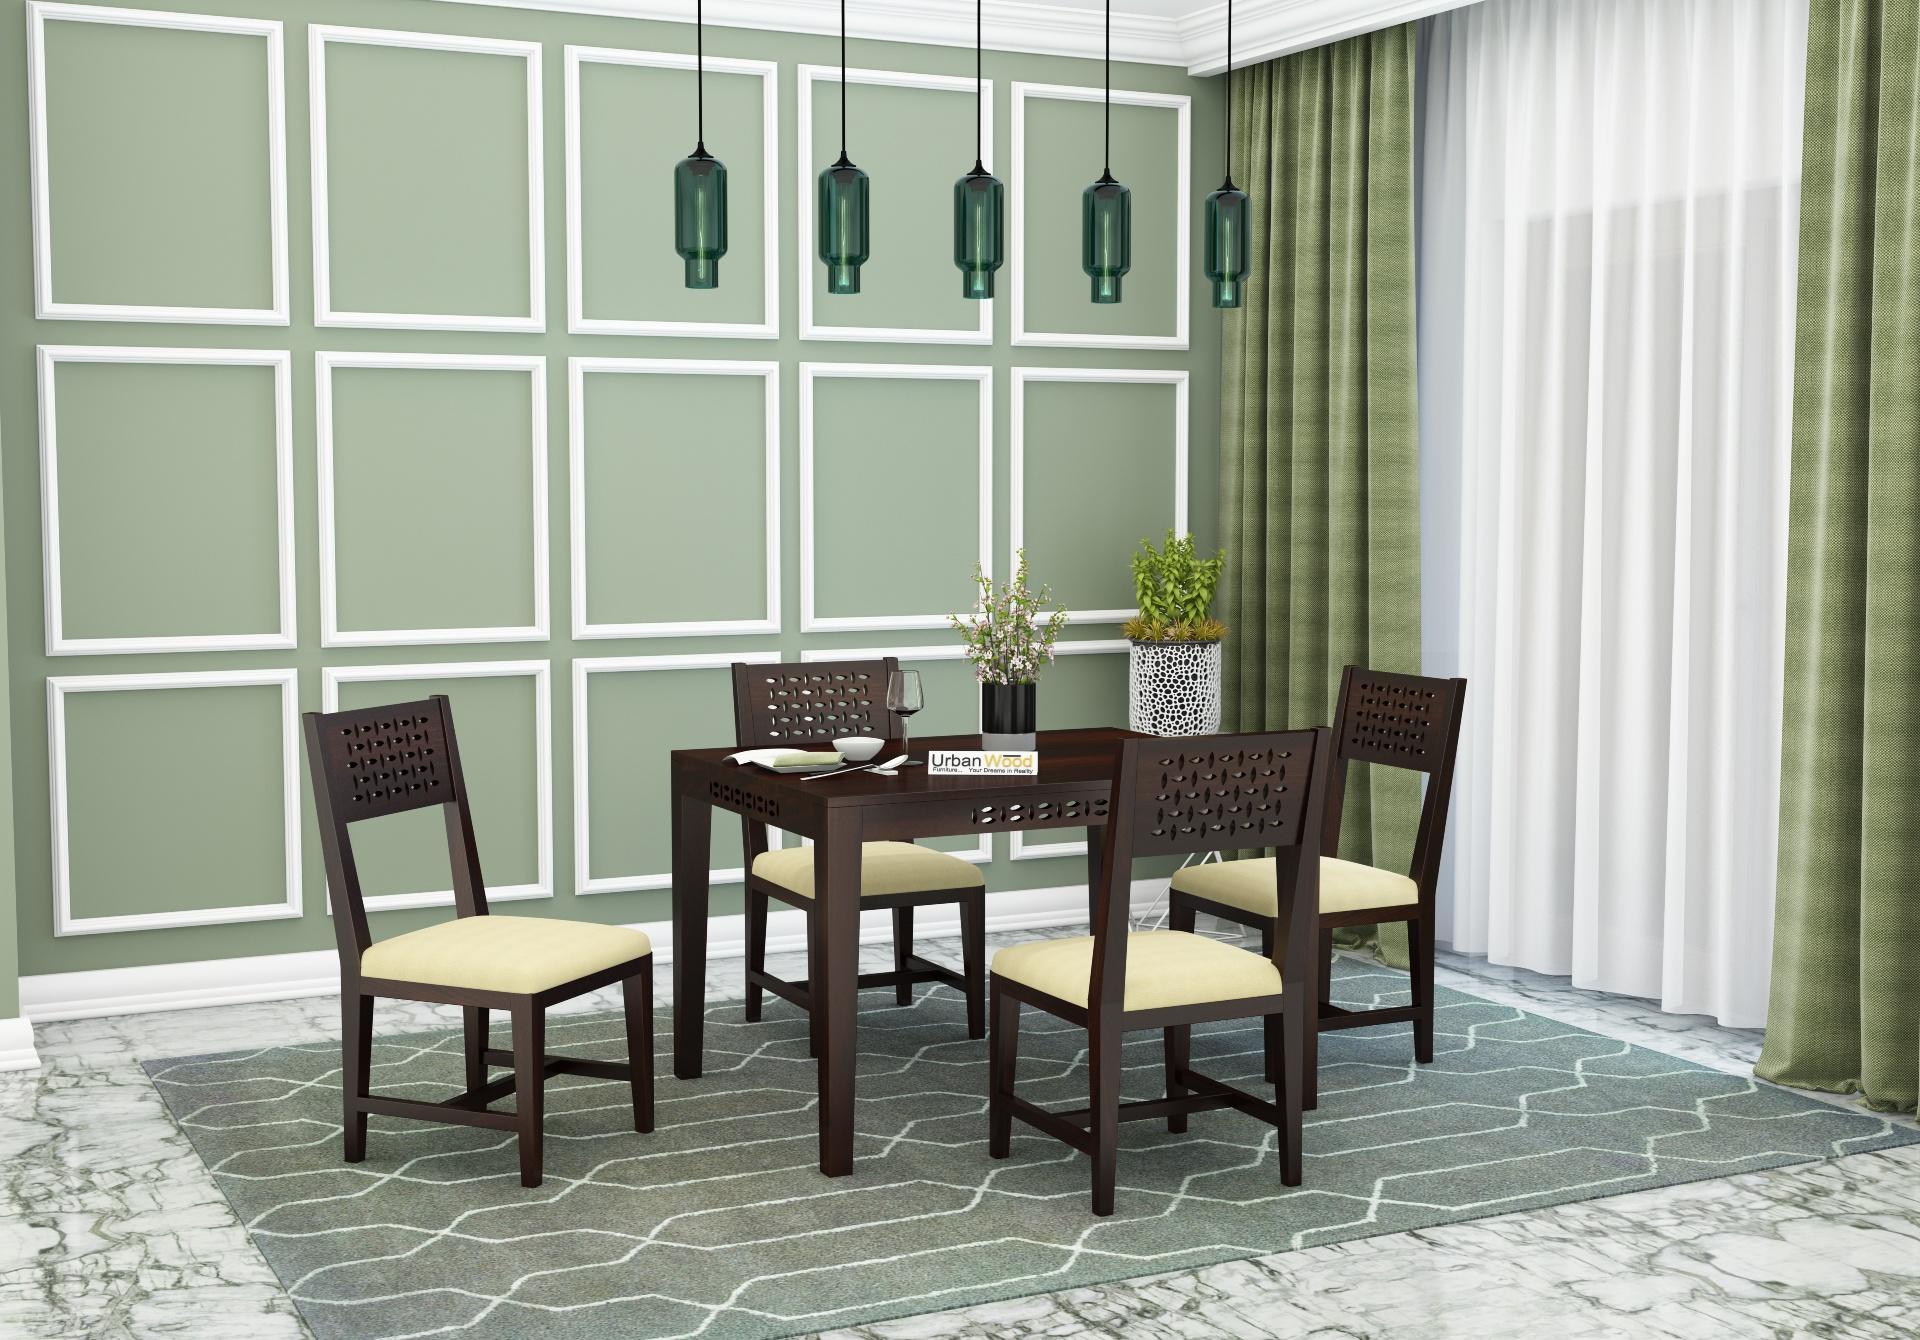 Woodora 4 Seater Dining Set with Cushion <small>(Walnut Finish)</small>